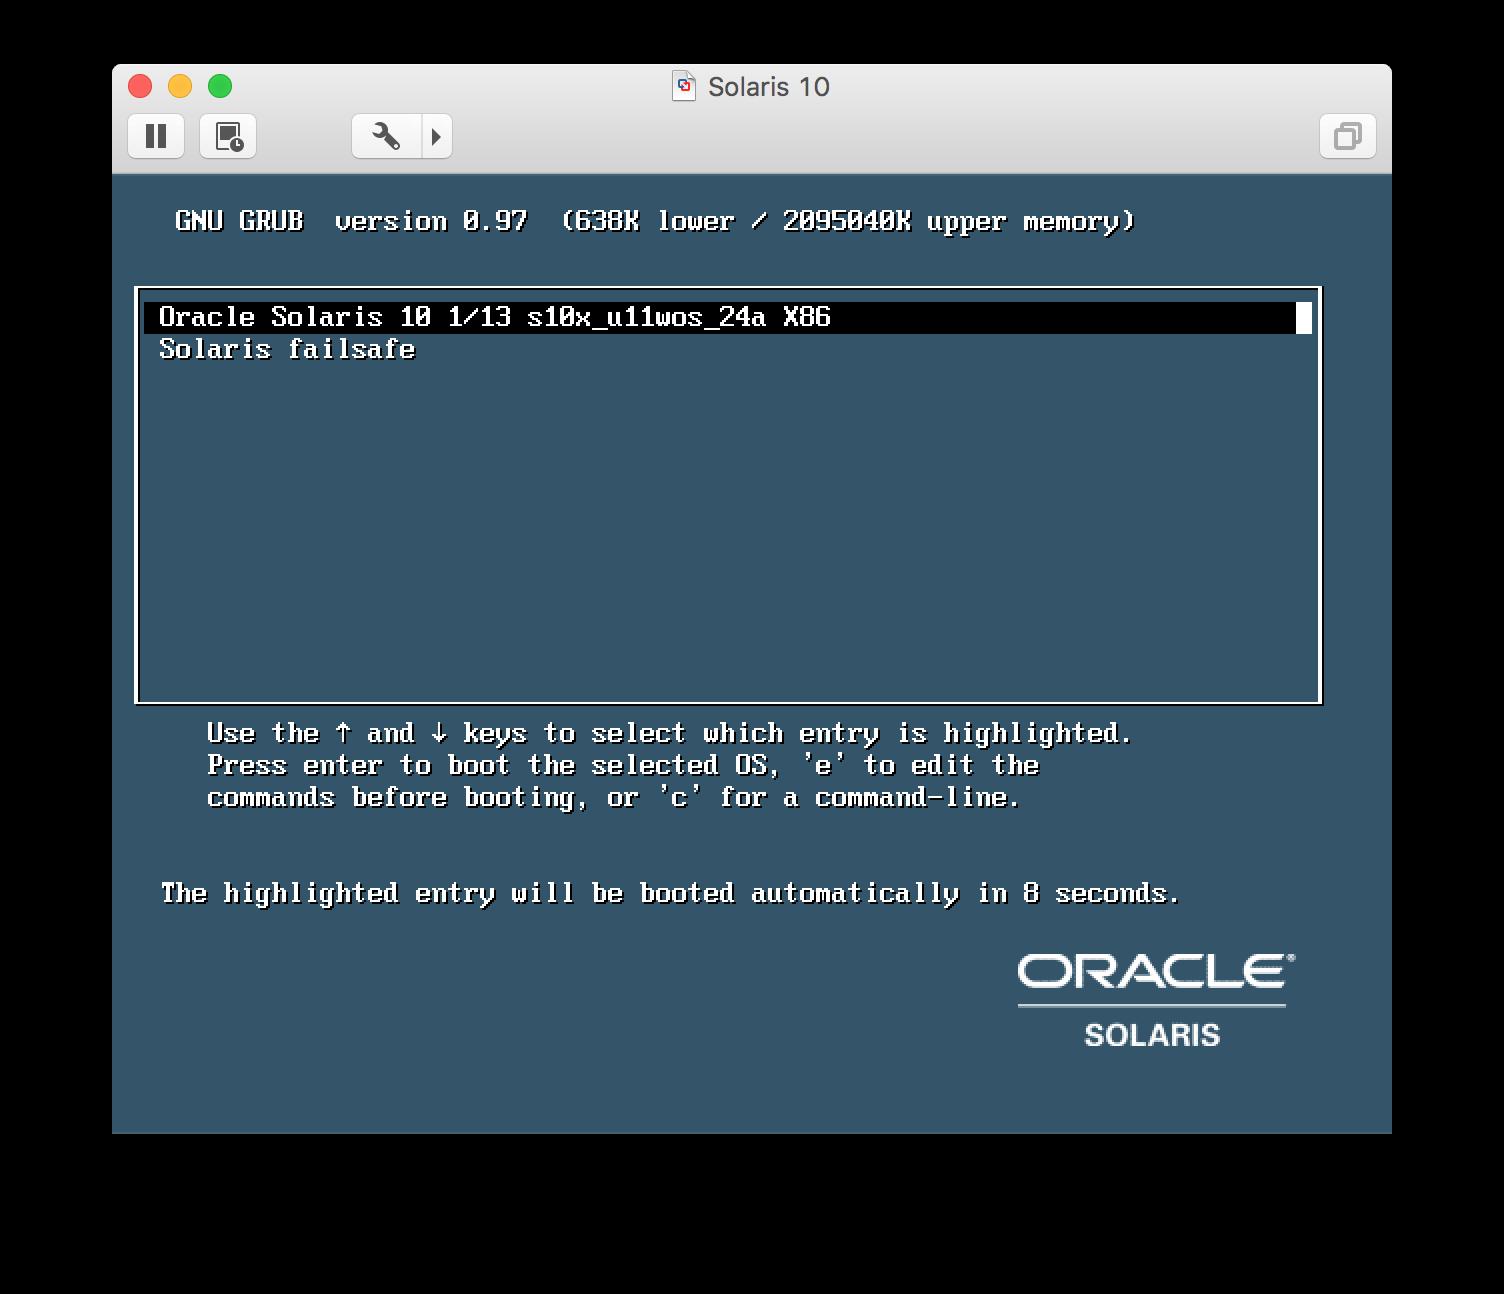 GitHub - jeroen/solarisvm: VMware image with R on Solaris